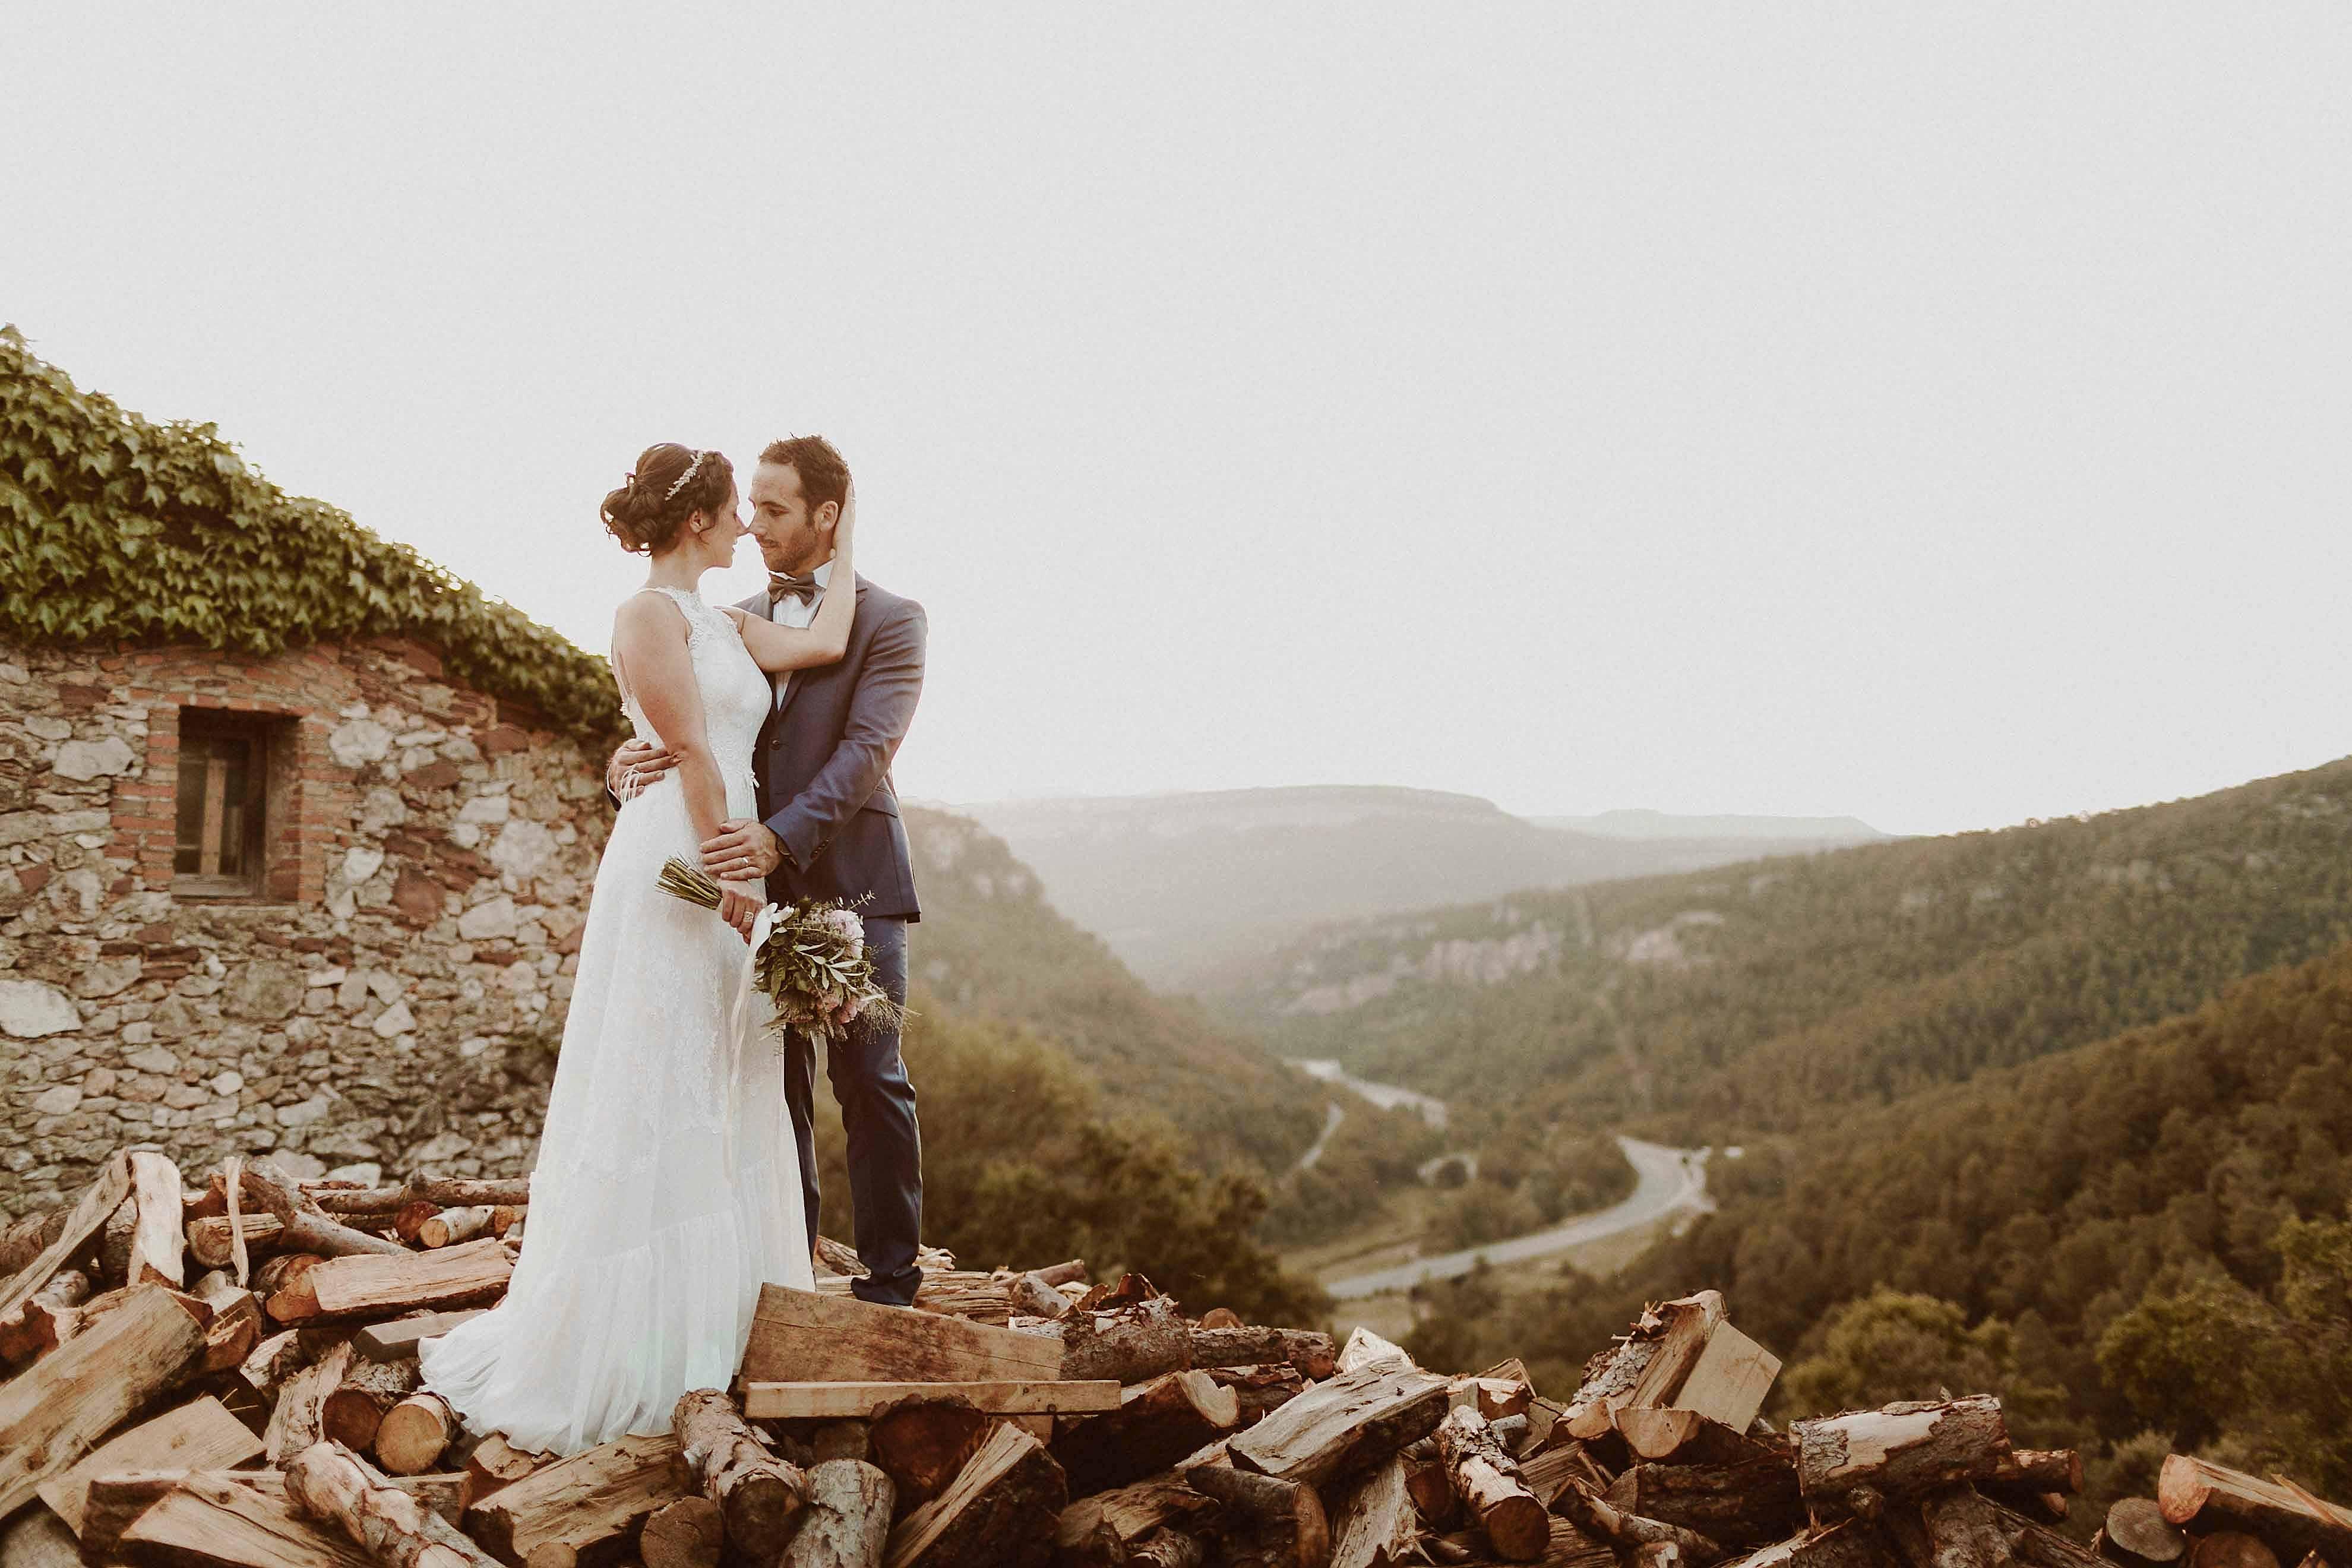 Boda rústica en la montaña. fotgrafo de bodas barcelona_081